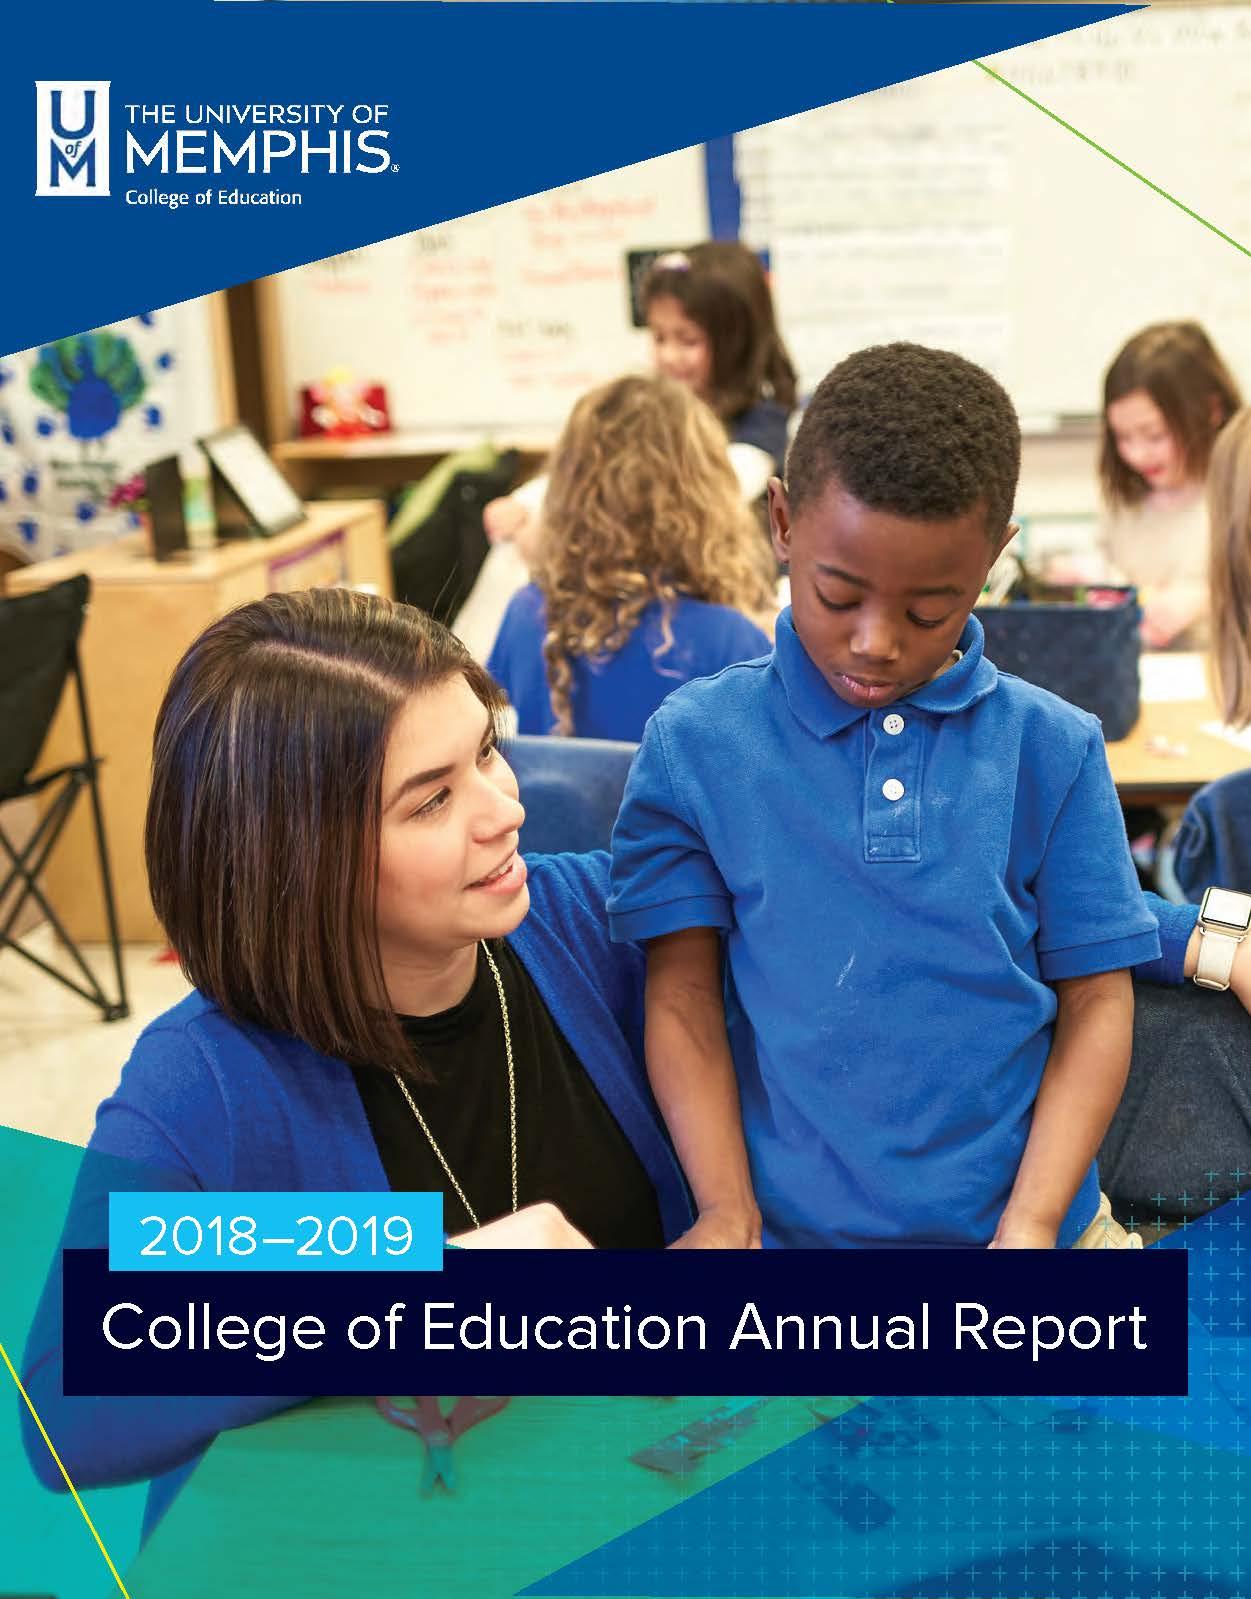 COE 2018-2019 Annual Report Cover image